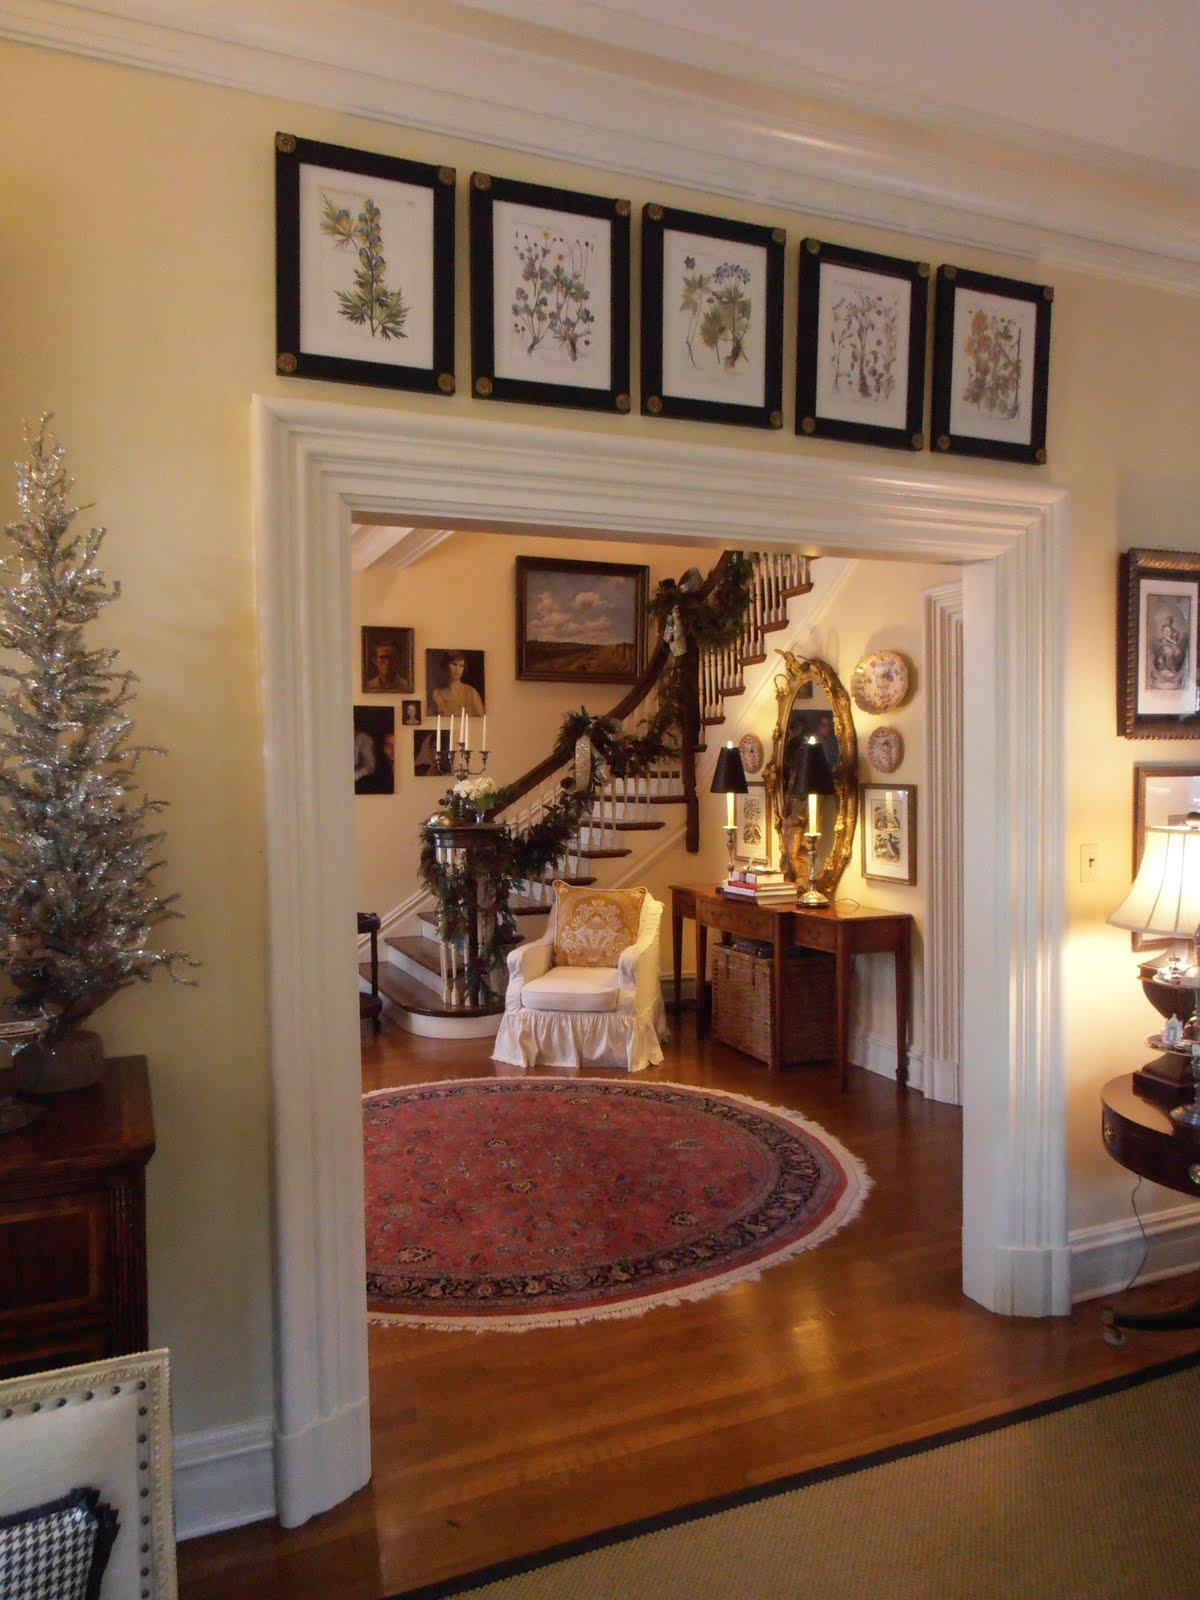 Tallgrass Design Mary Carol Garrity House Tour